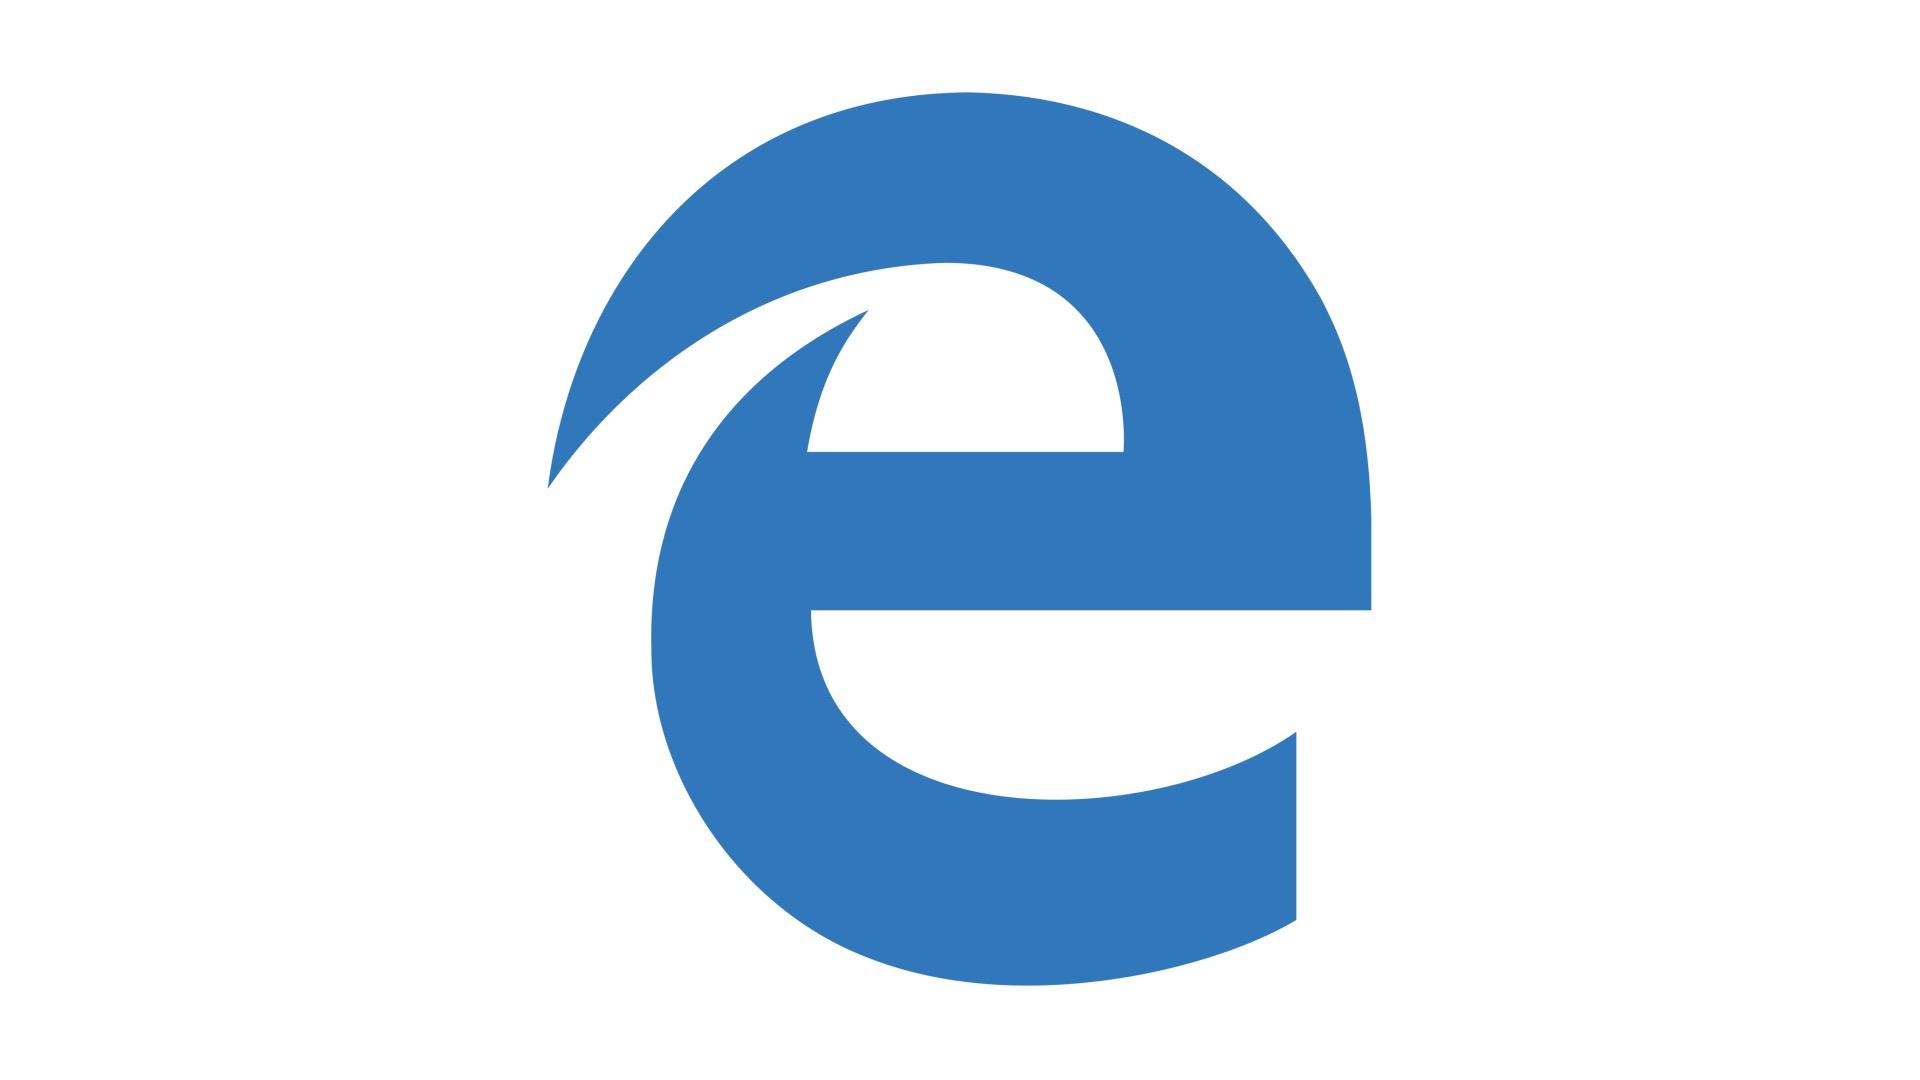 Microsoft заставляет пользователей Chrome и Firefox переходить на Edge